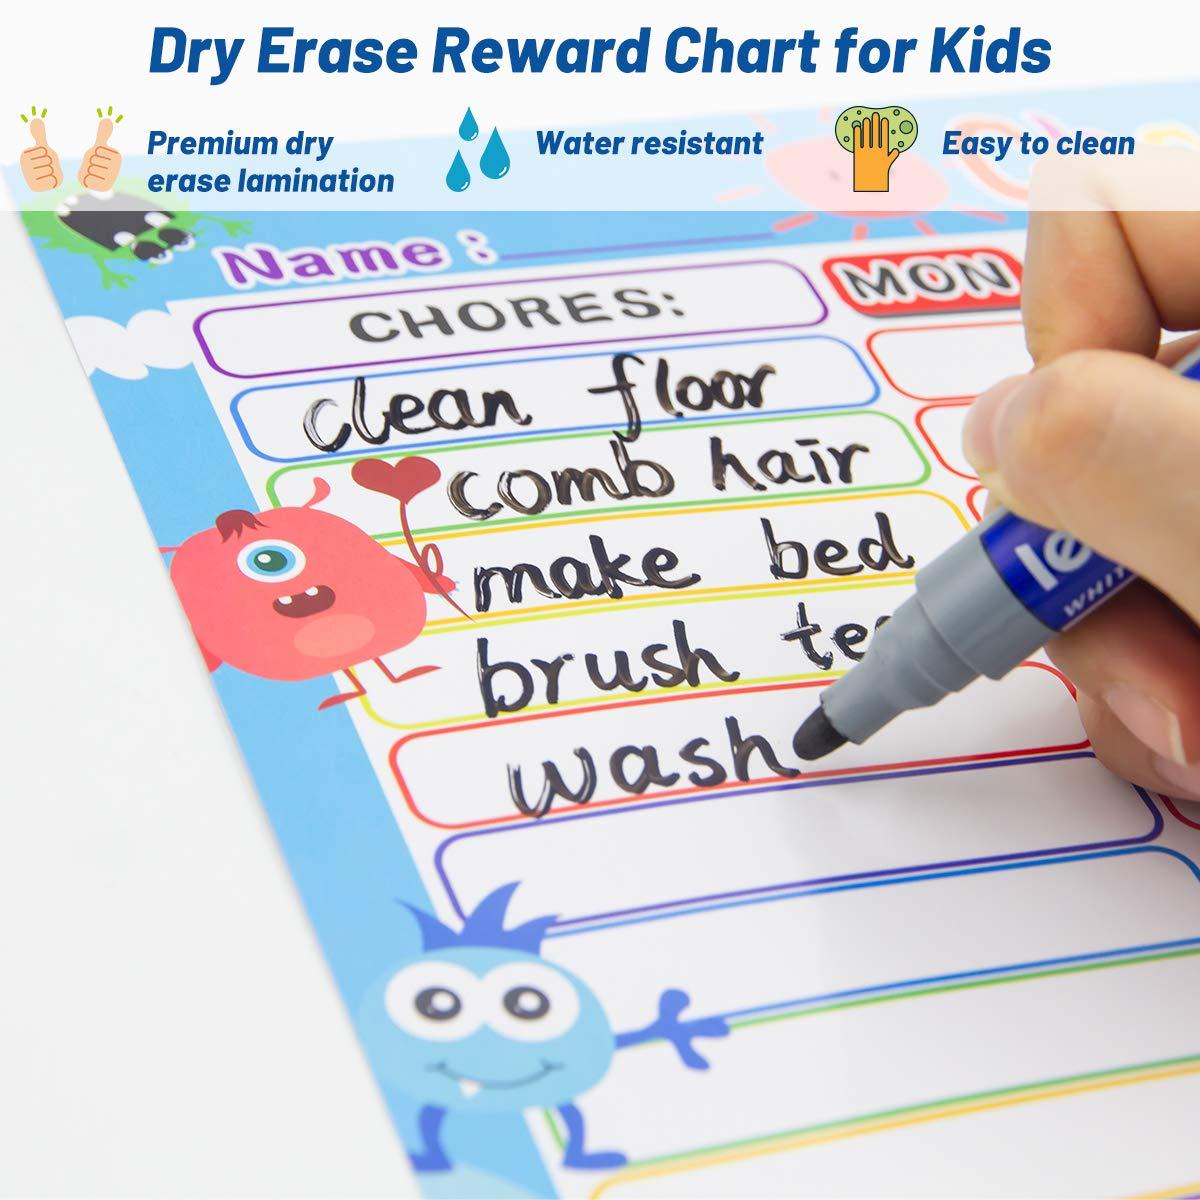 Chore Chart for Kids Dry Erase Reward Chart Reusable Self-Adhesive Behavior Chart